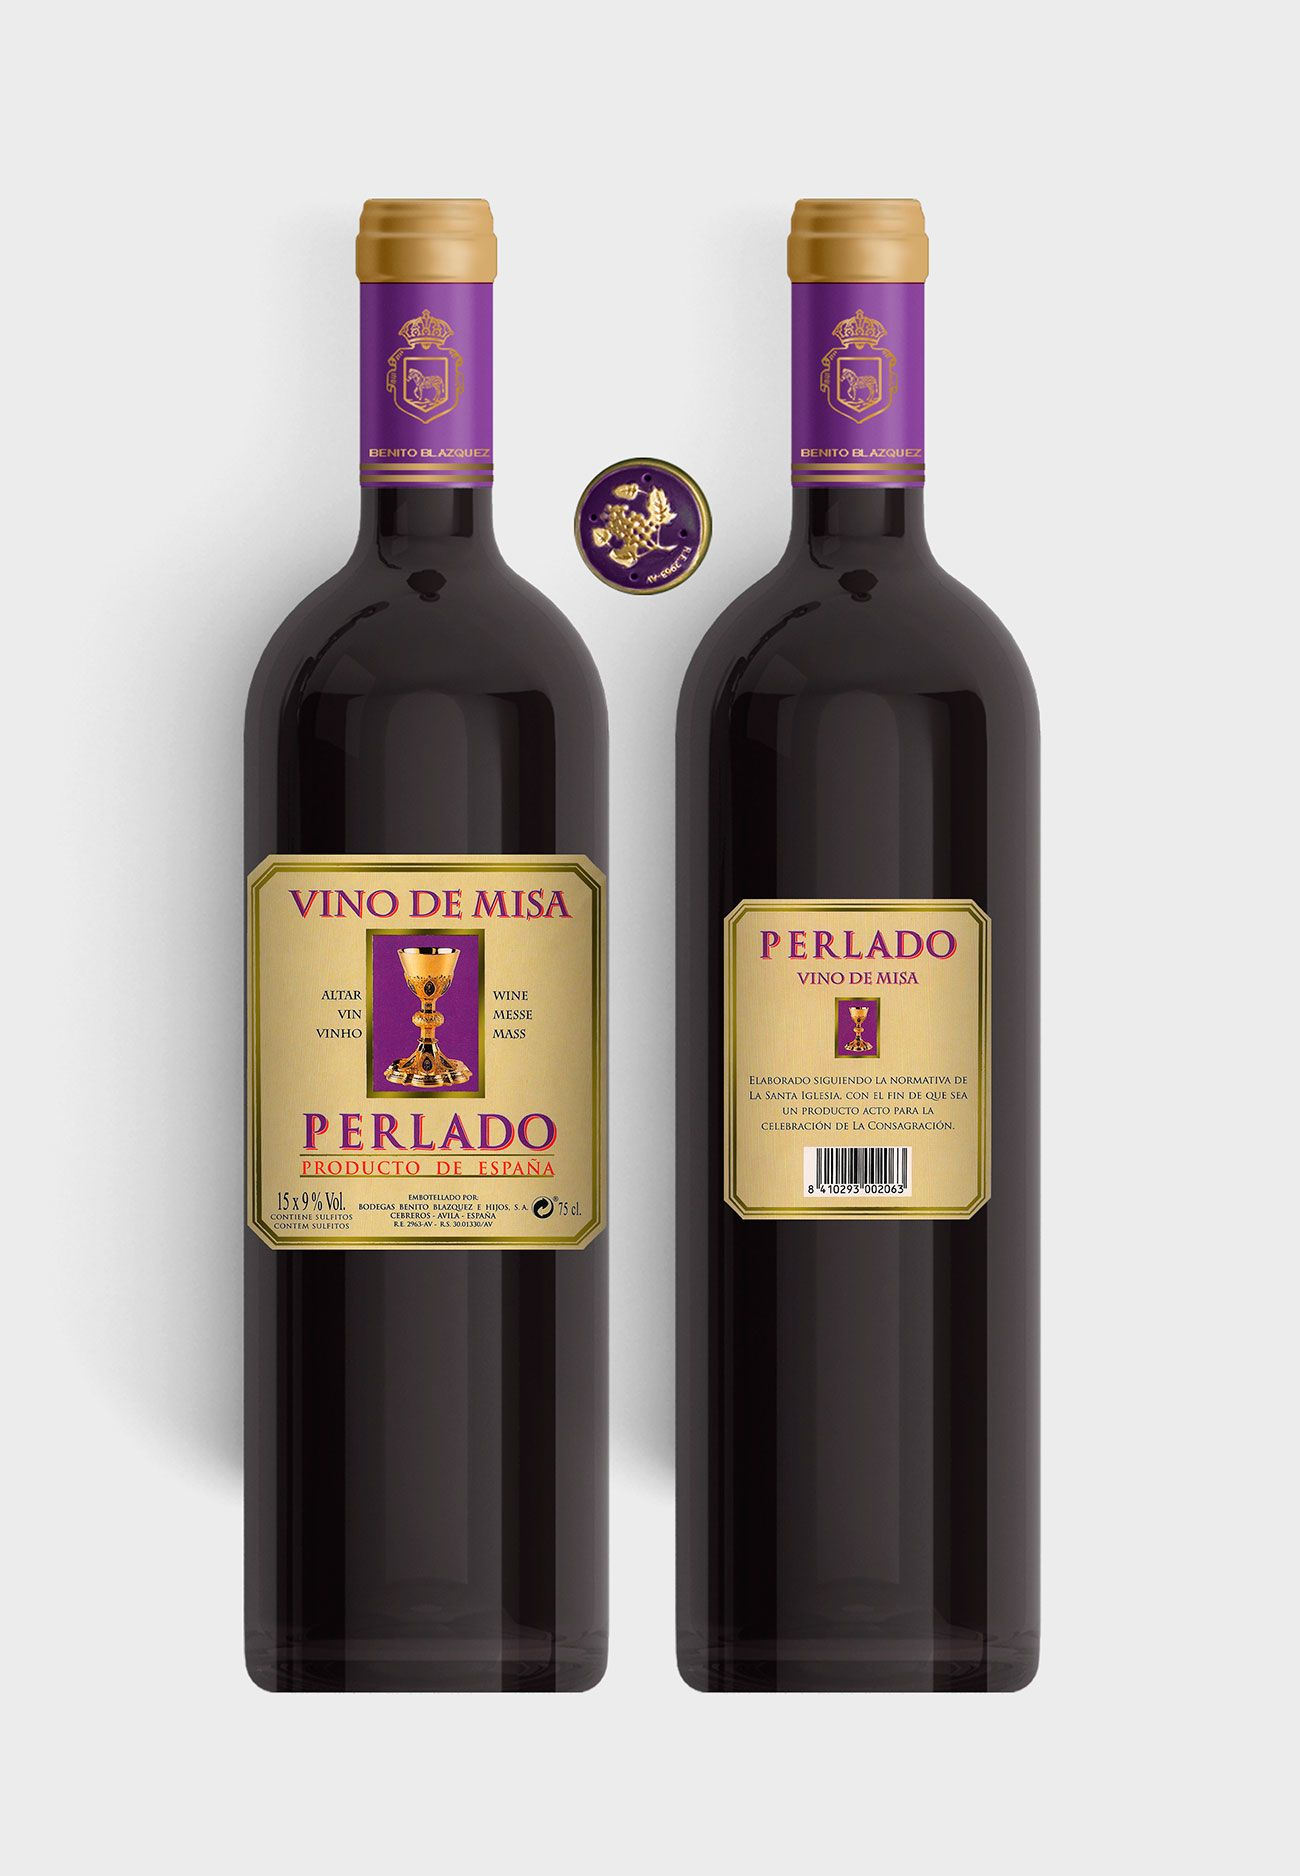 Benito Blázquez - Botella de Vino de Misa